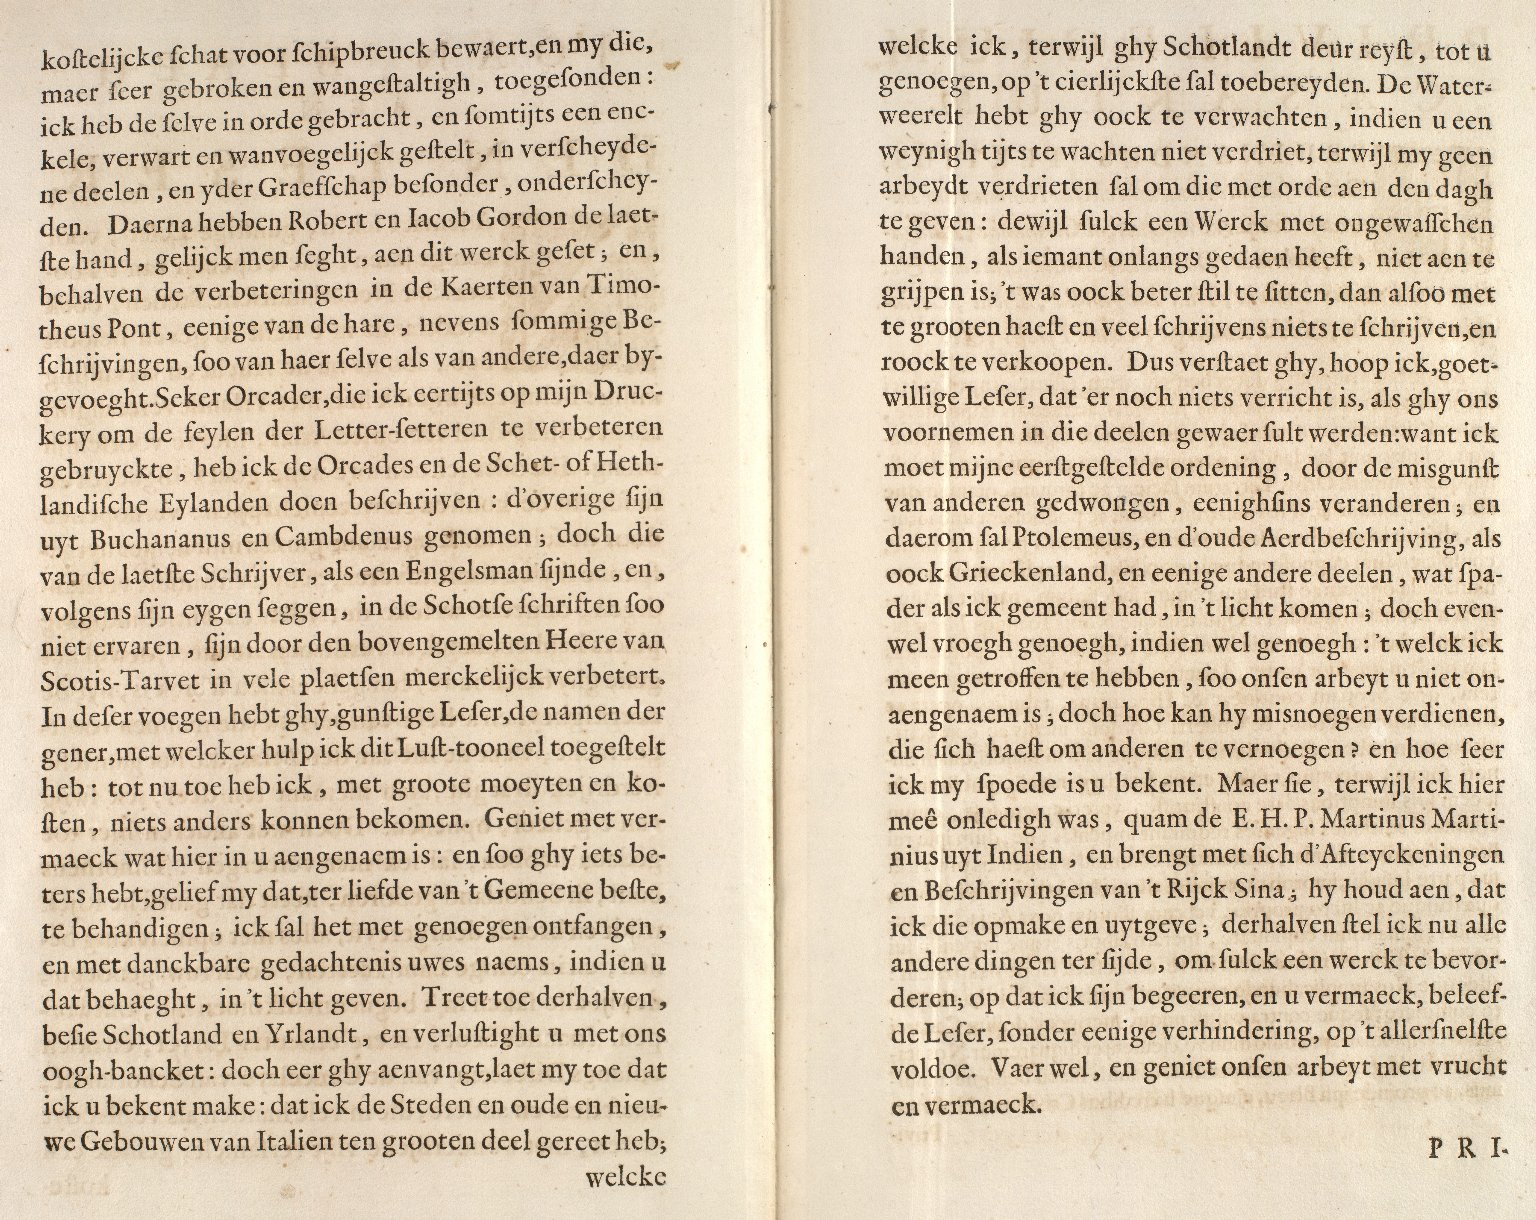 [Geographiae Blavianae] [Also known as: Atlas major] [005 of 153]